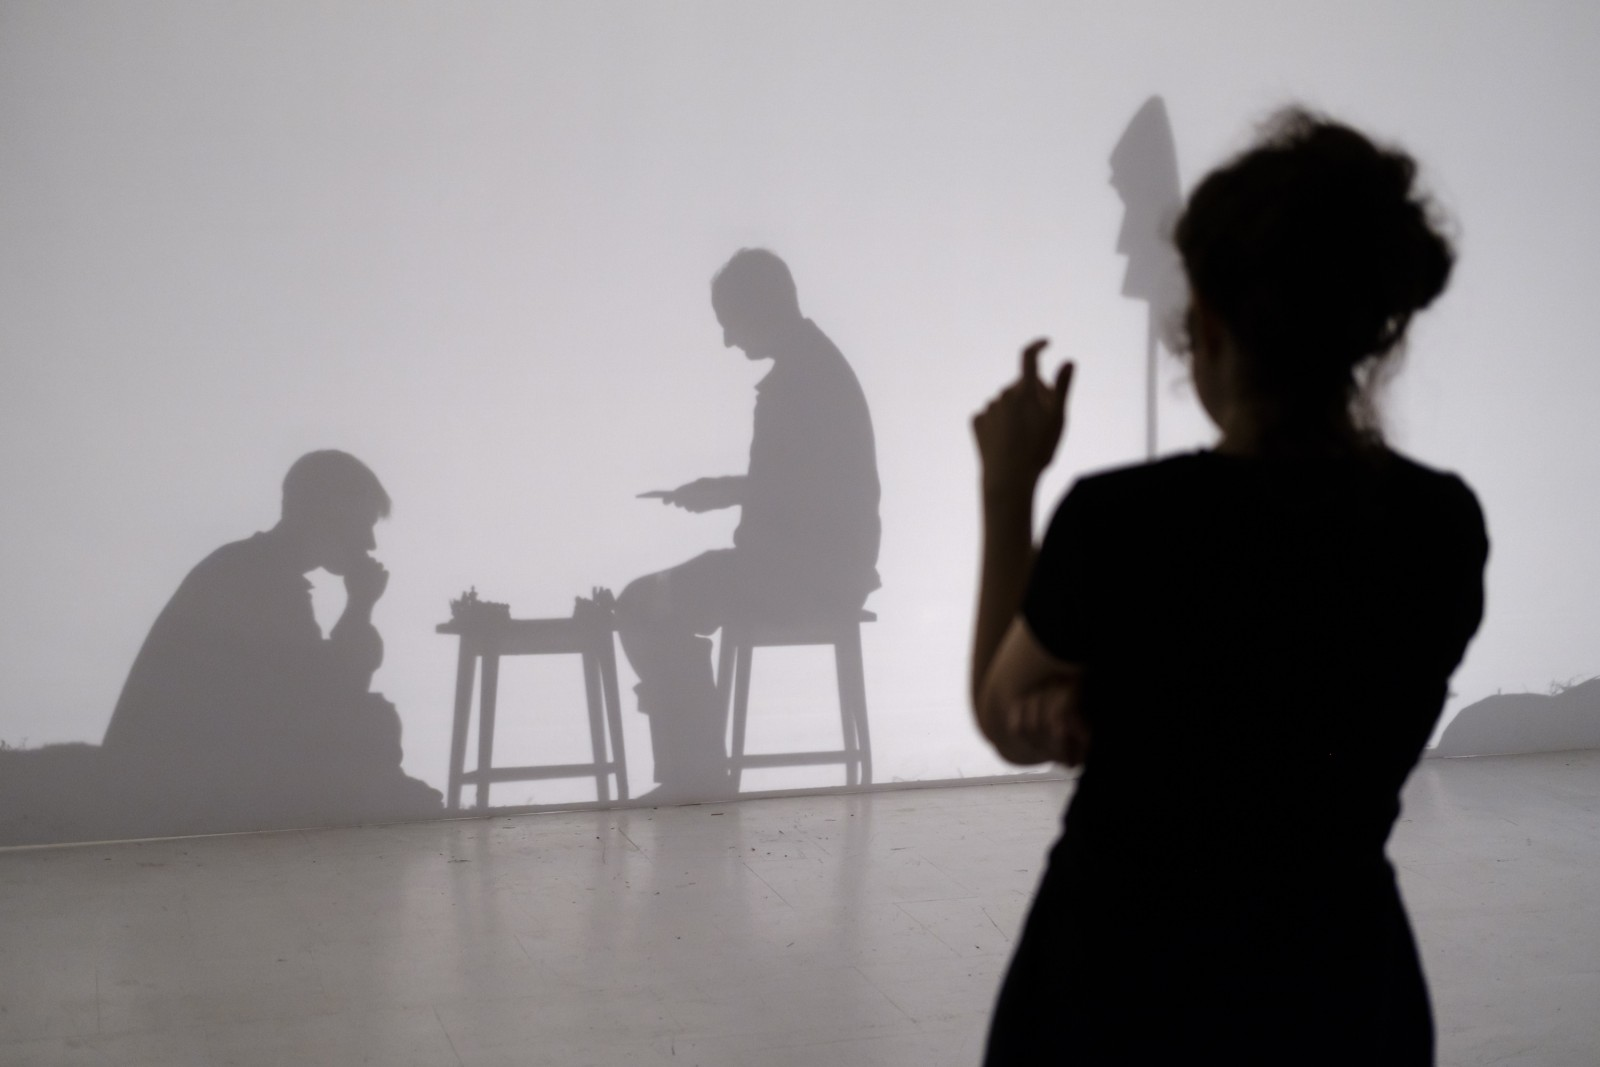 Yael Vishnizki-Levi, Polen, Bildende Kunst/Film